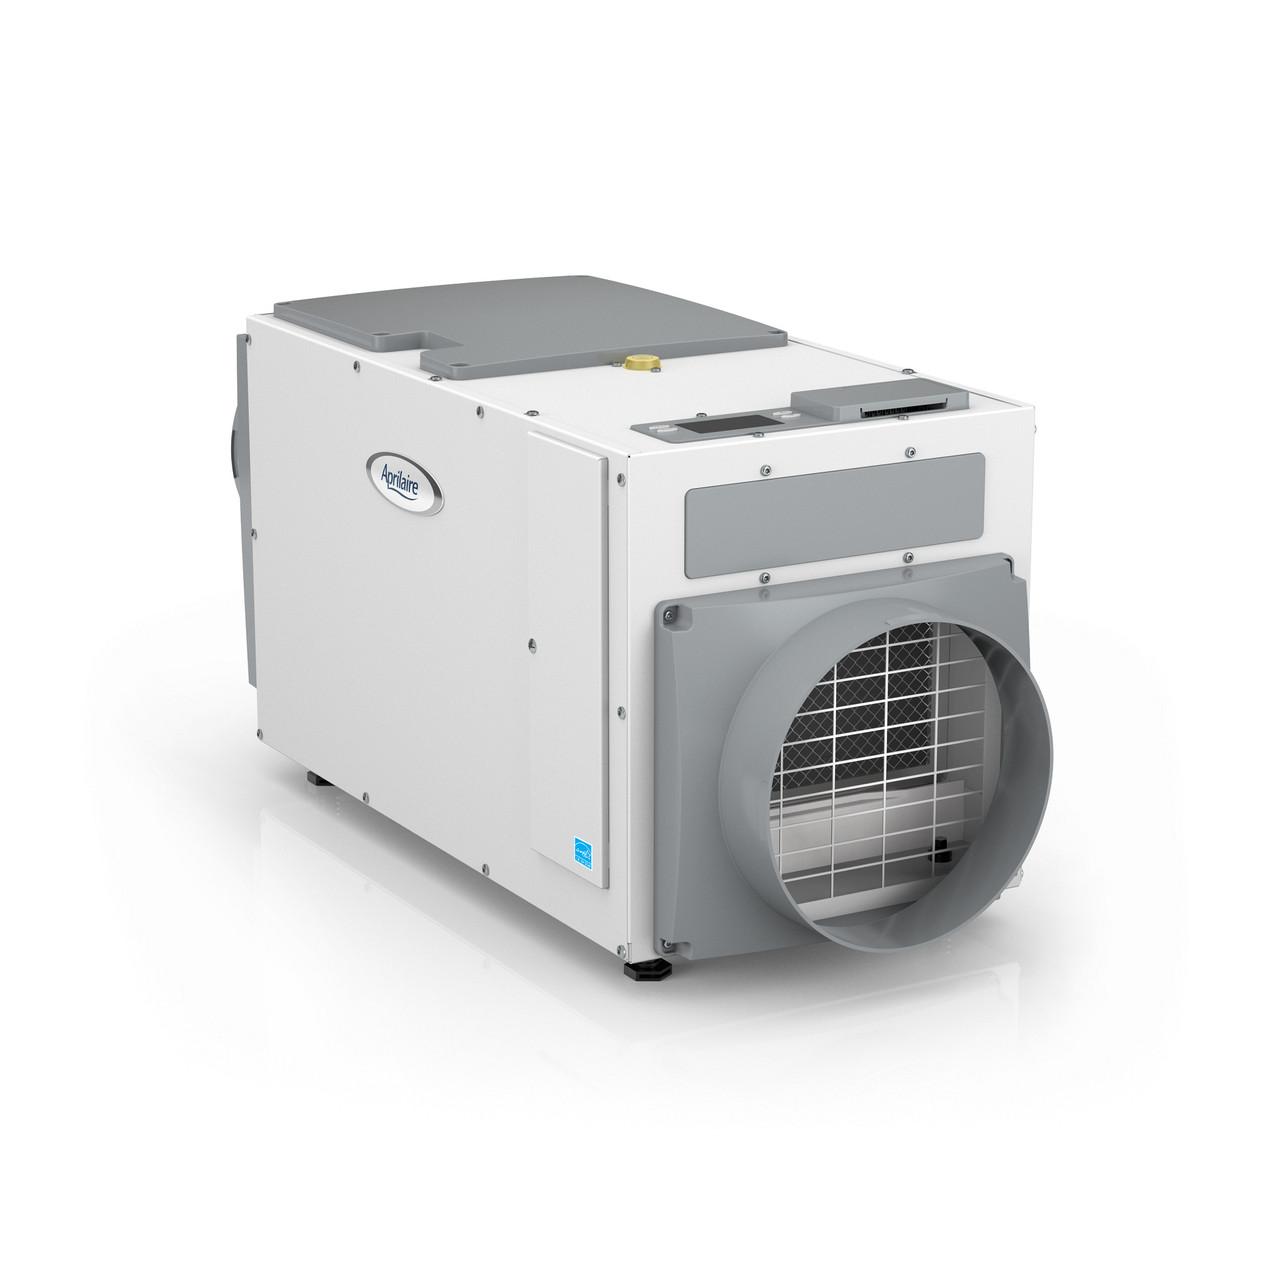 Aprilaire Model E100 Dehumidifier